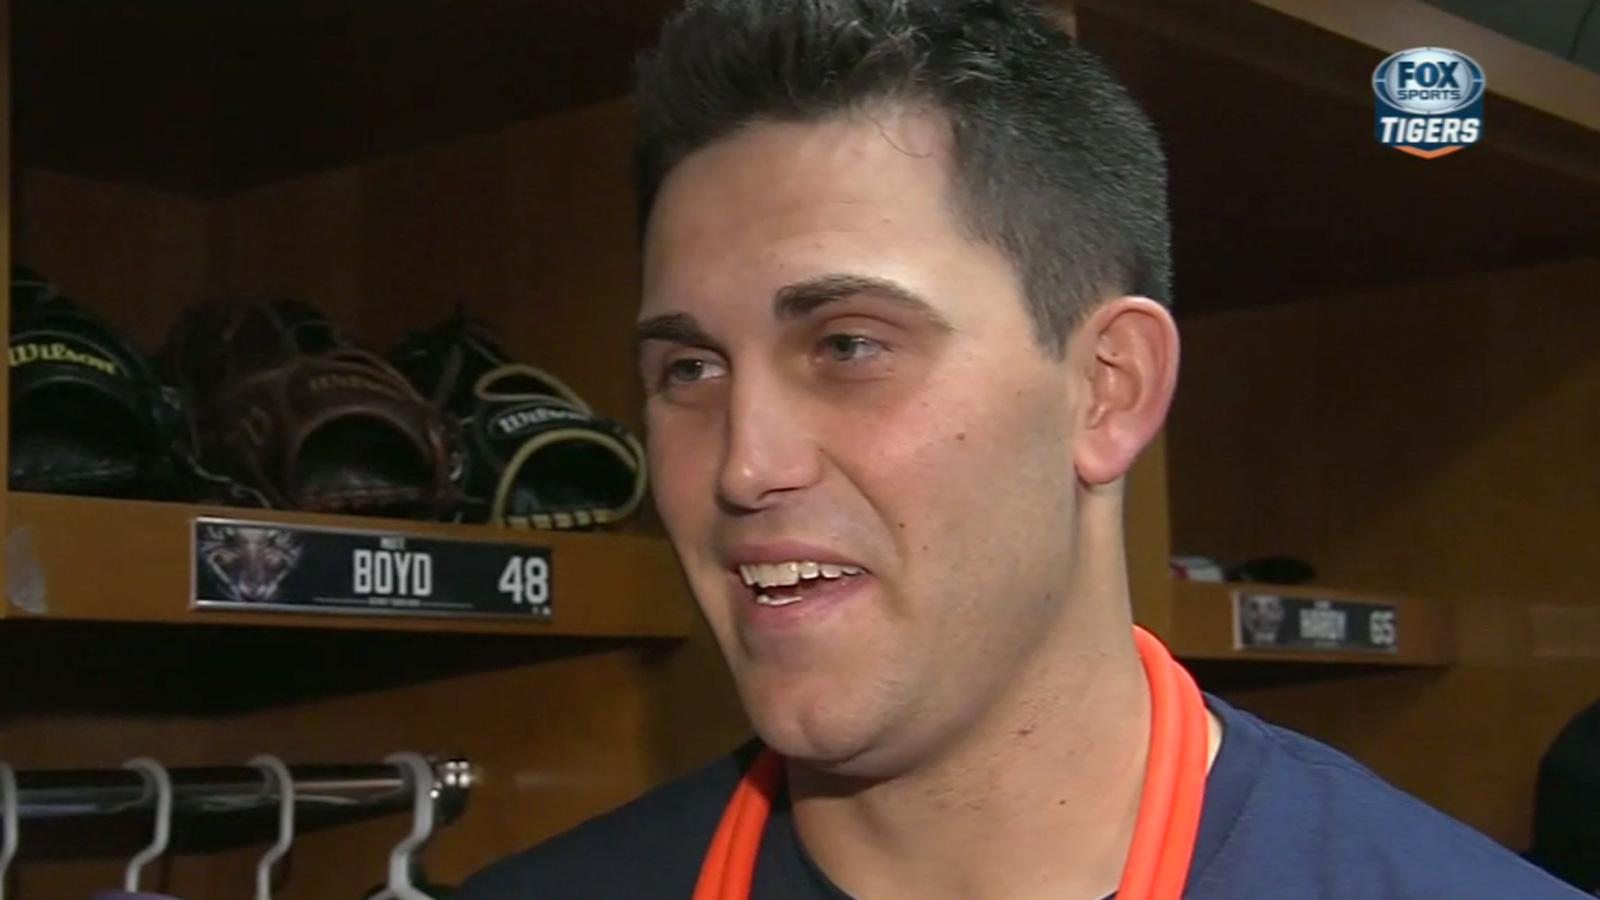 Tigers Pregame 8.10.15: Matt Boyd (VIDEO)